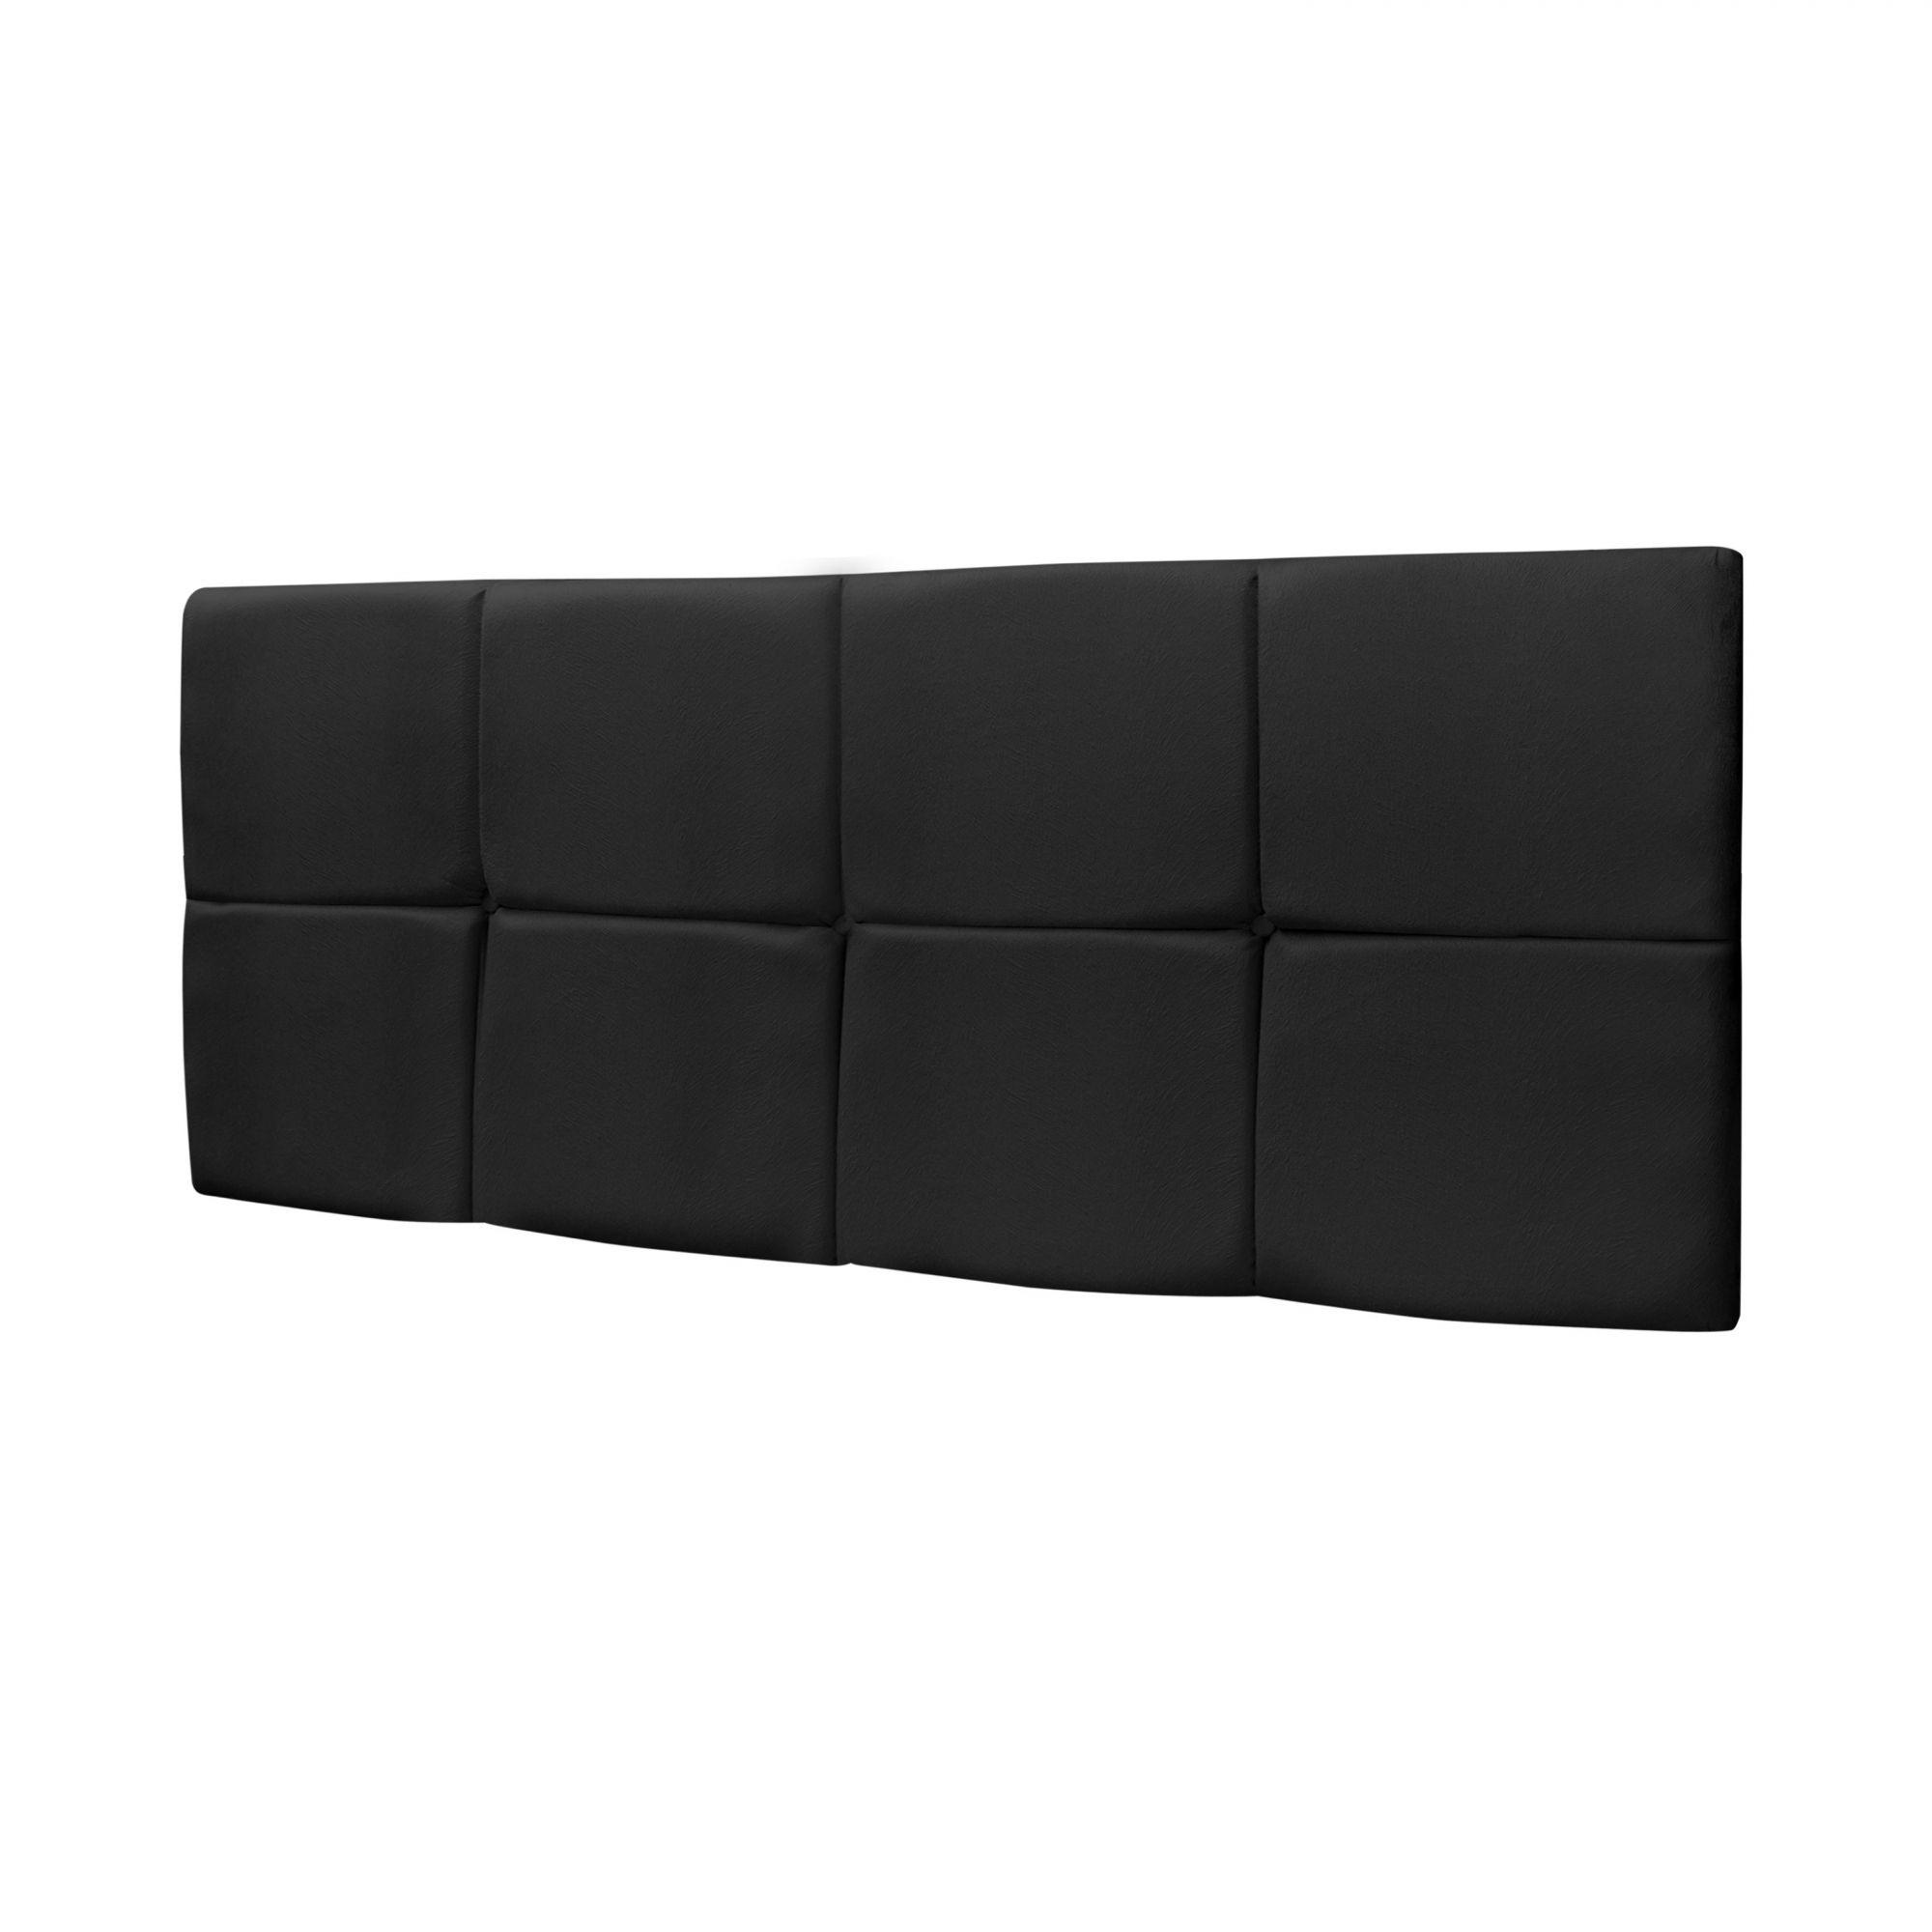 Cabeceira Box Casal Bella 1.40 Suede Preto - LH Móveis